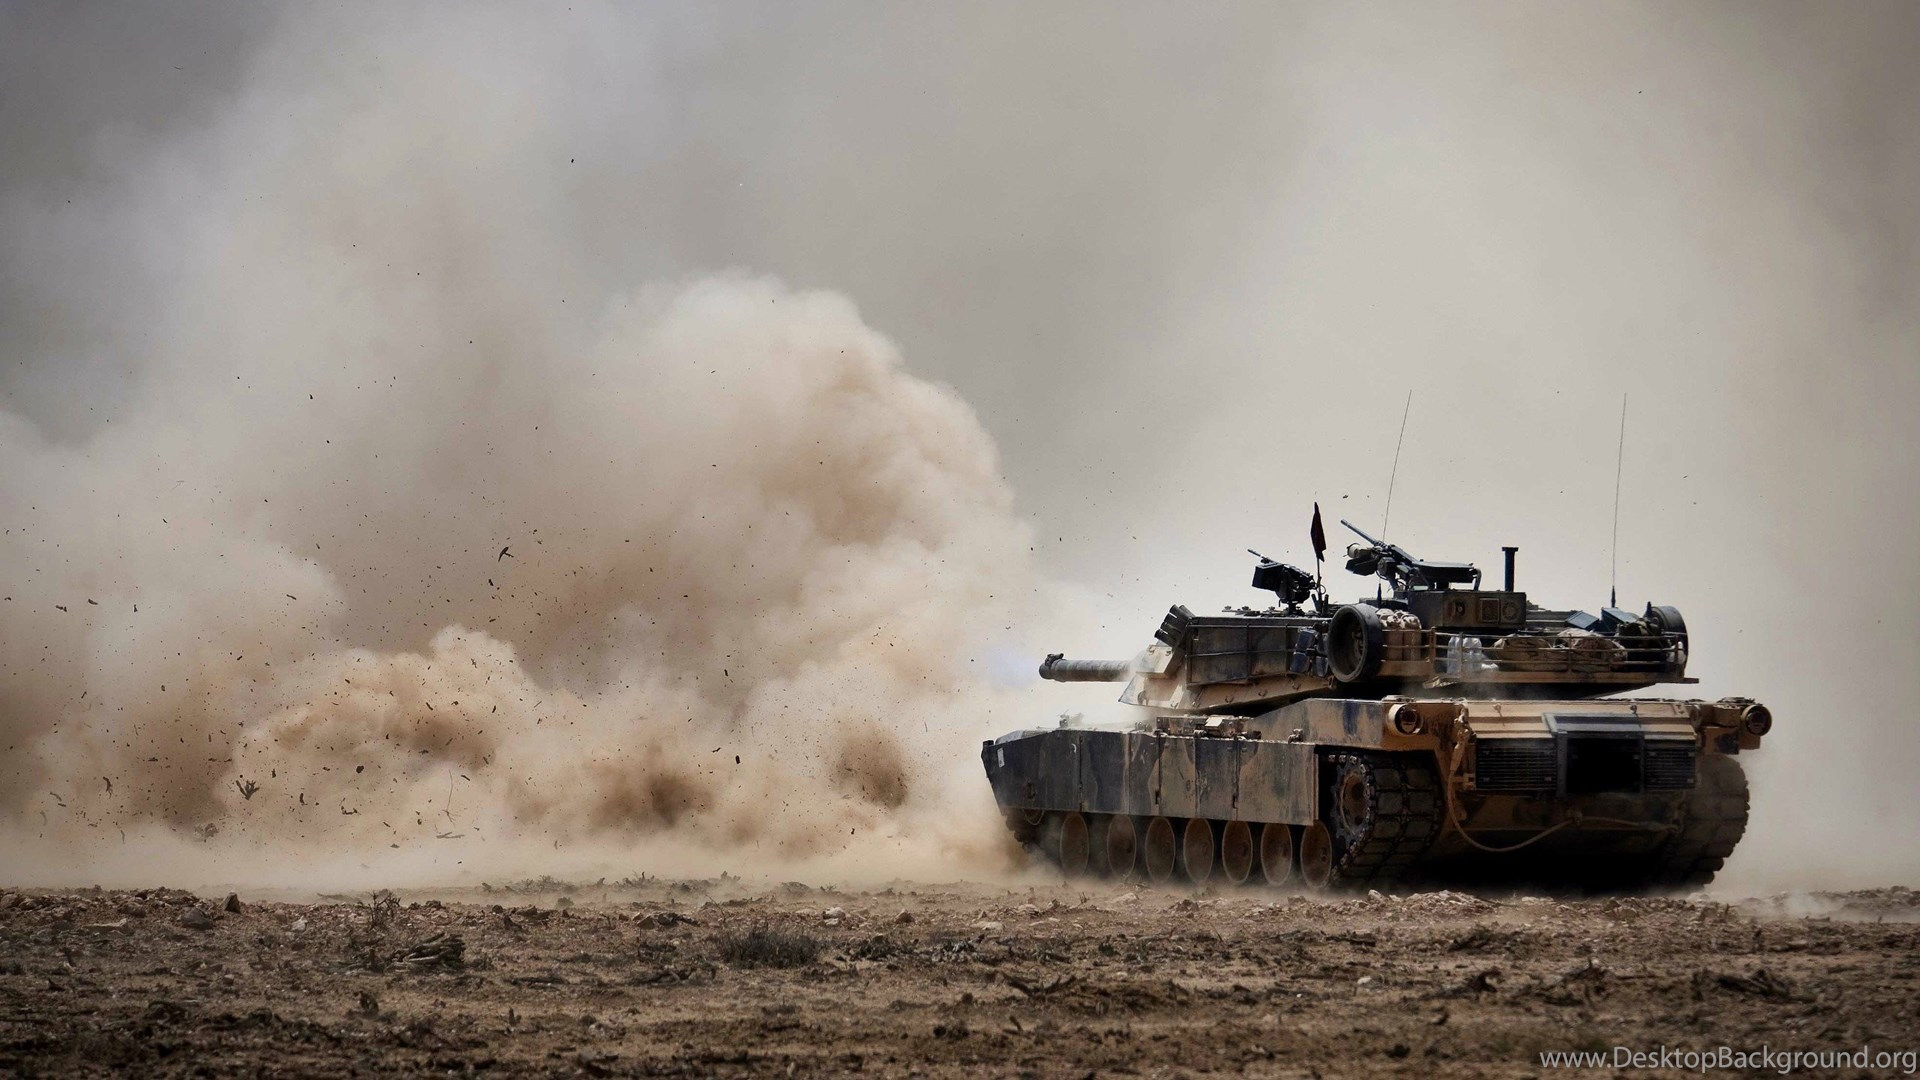 Military Tank M1 Abrams USMC Wallpapers HD Desktop Background